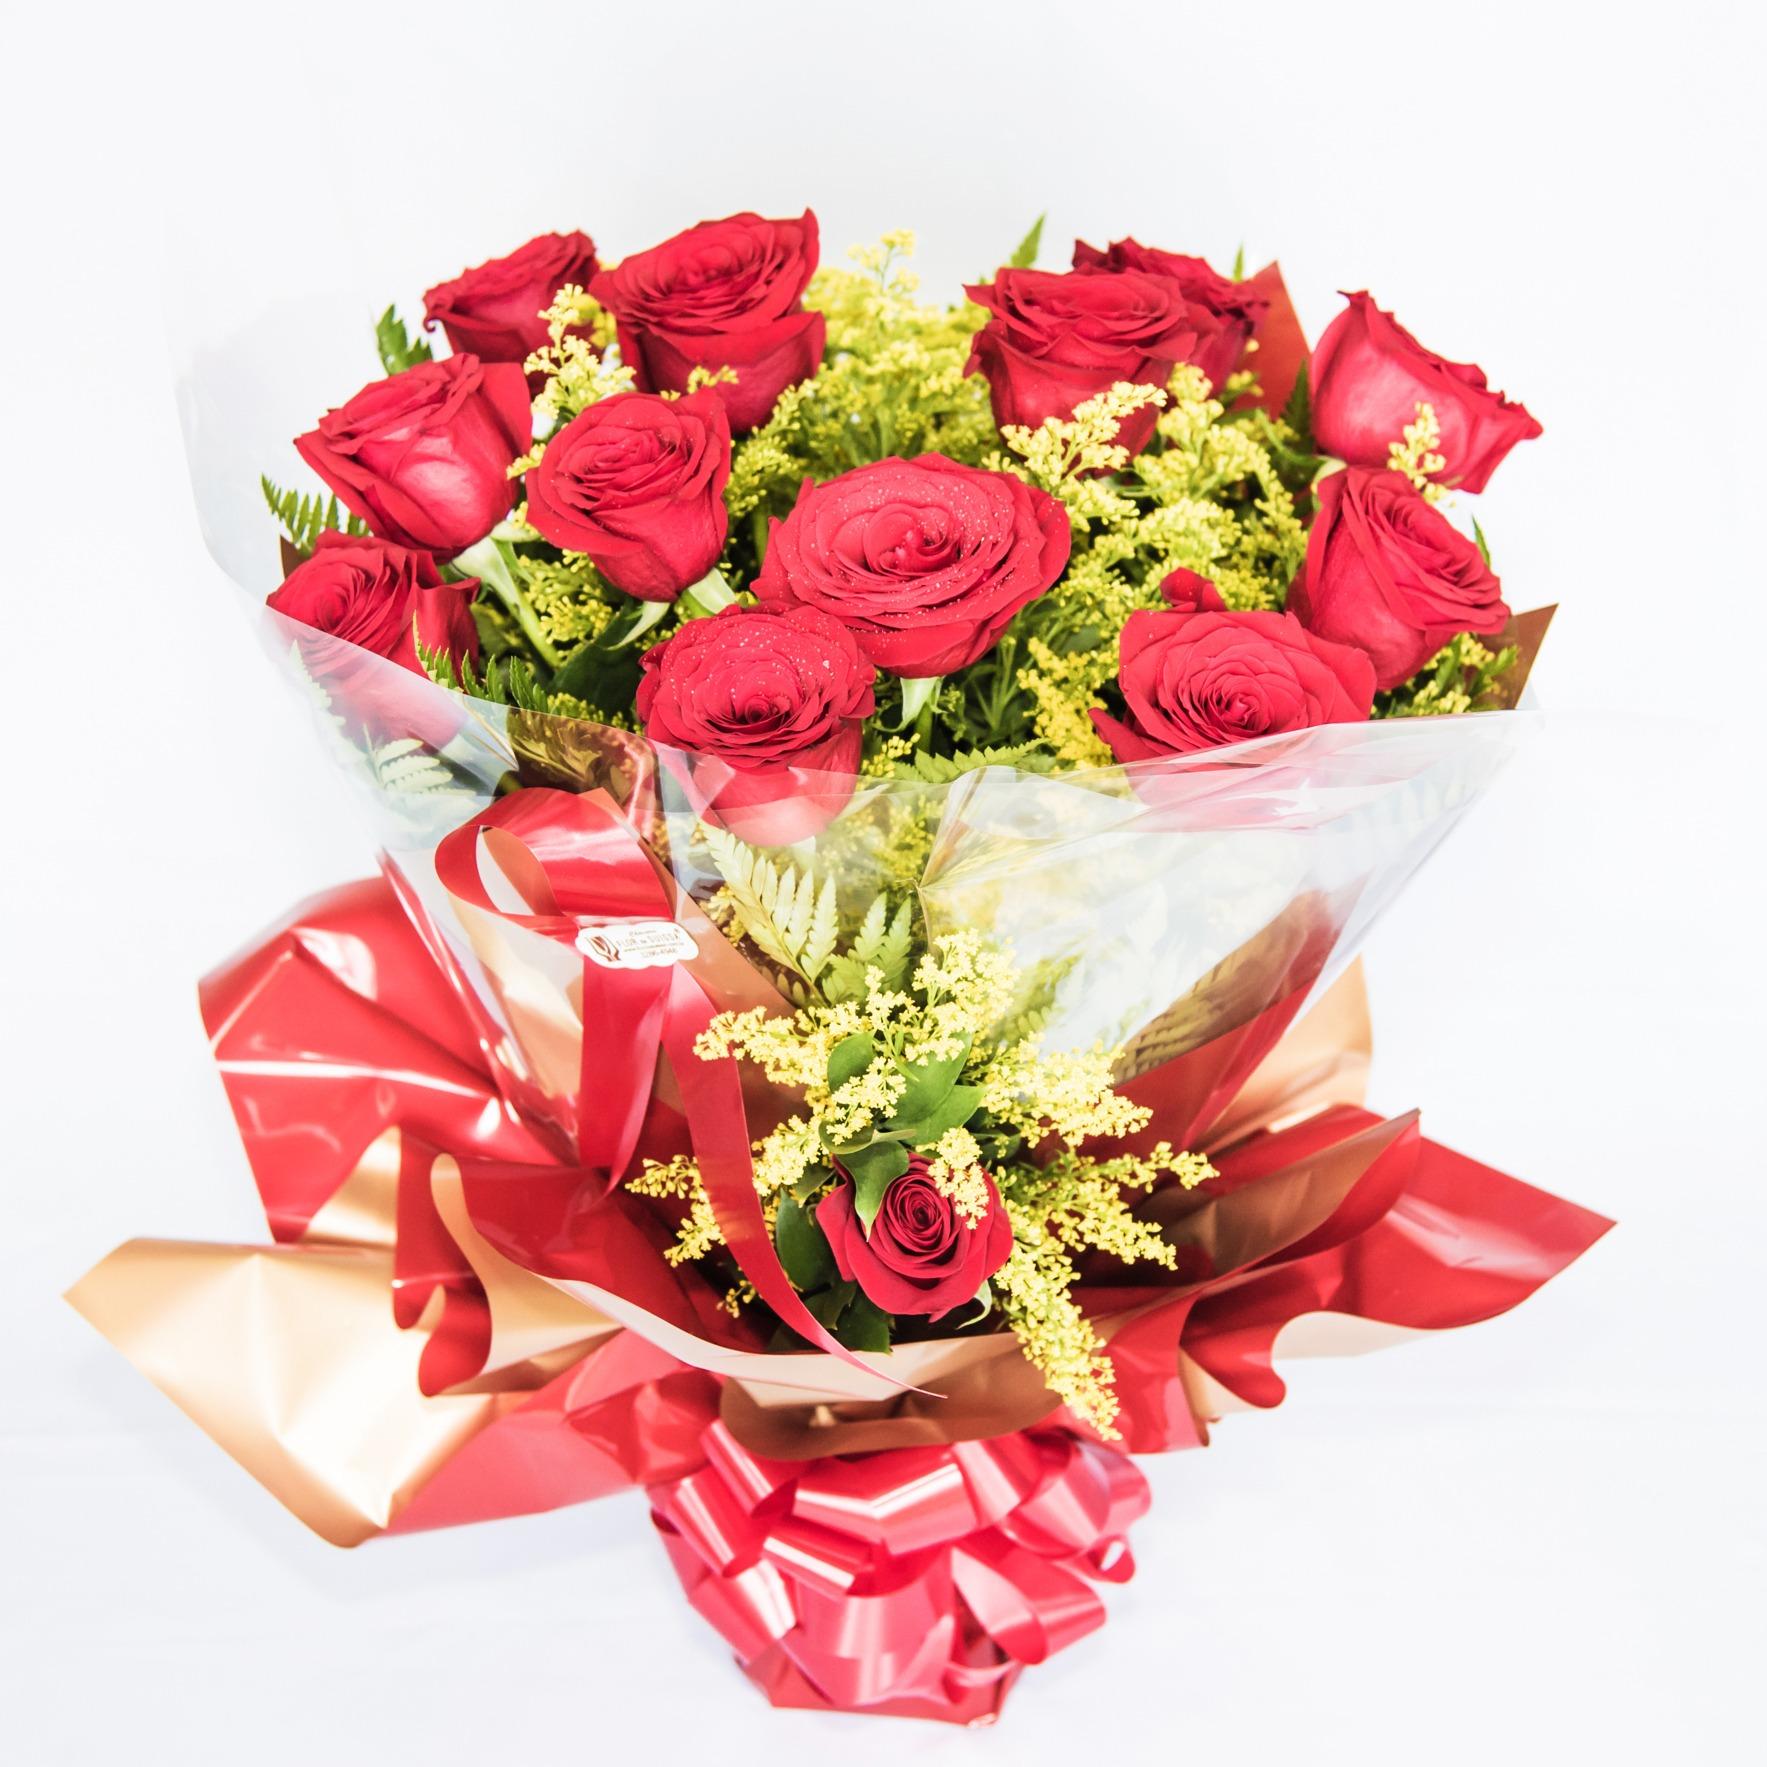 Flor da Suissa - Loja virtual